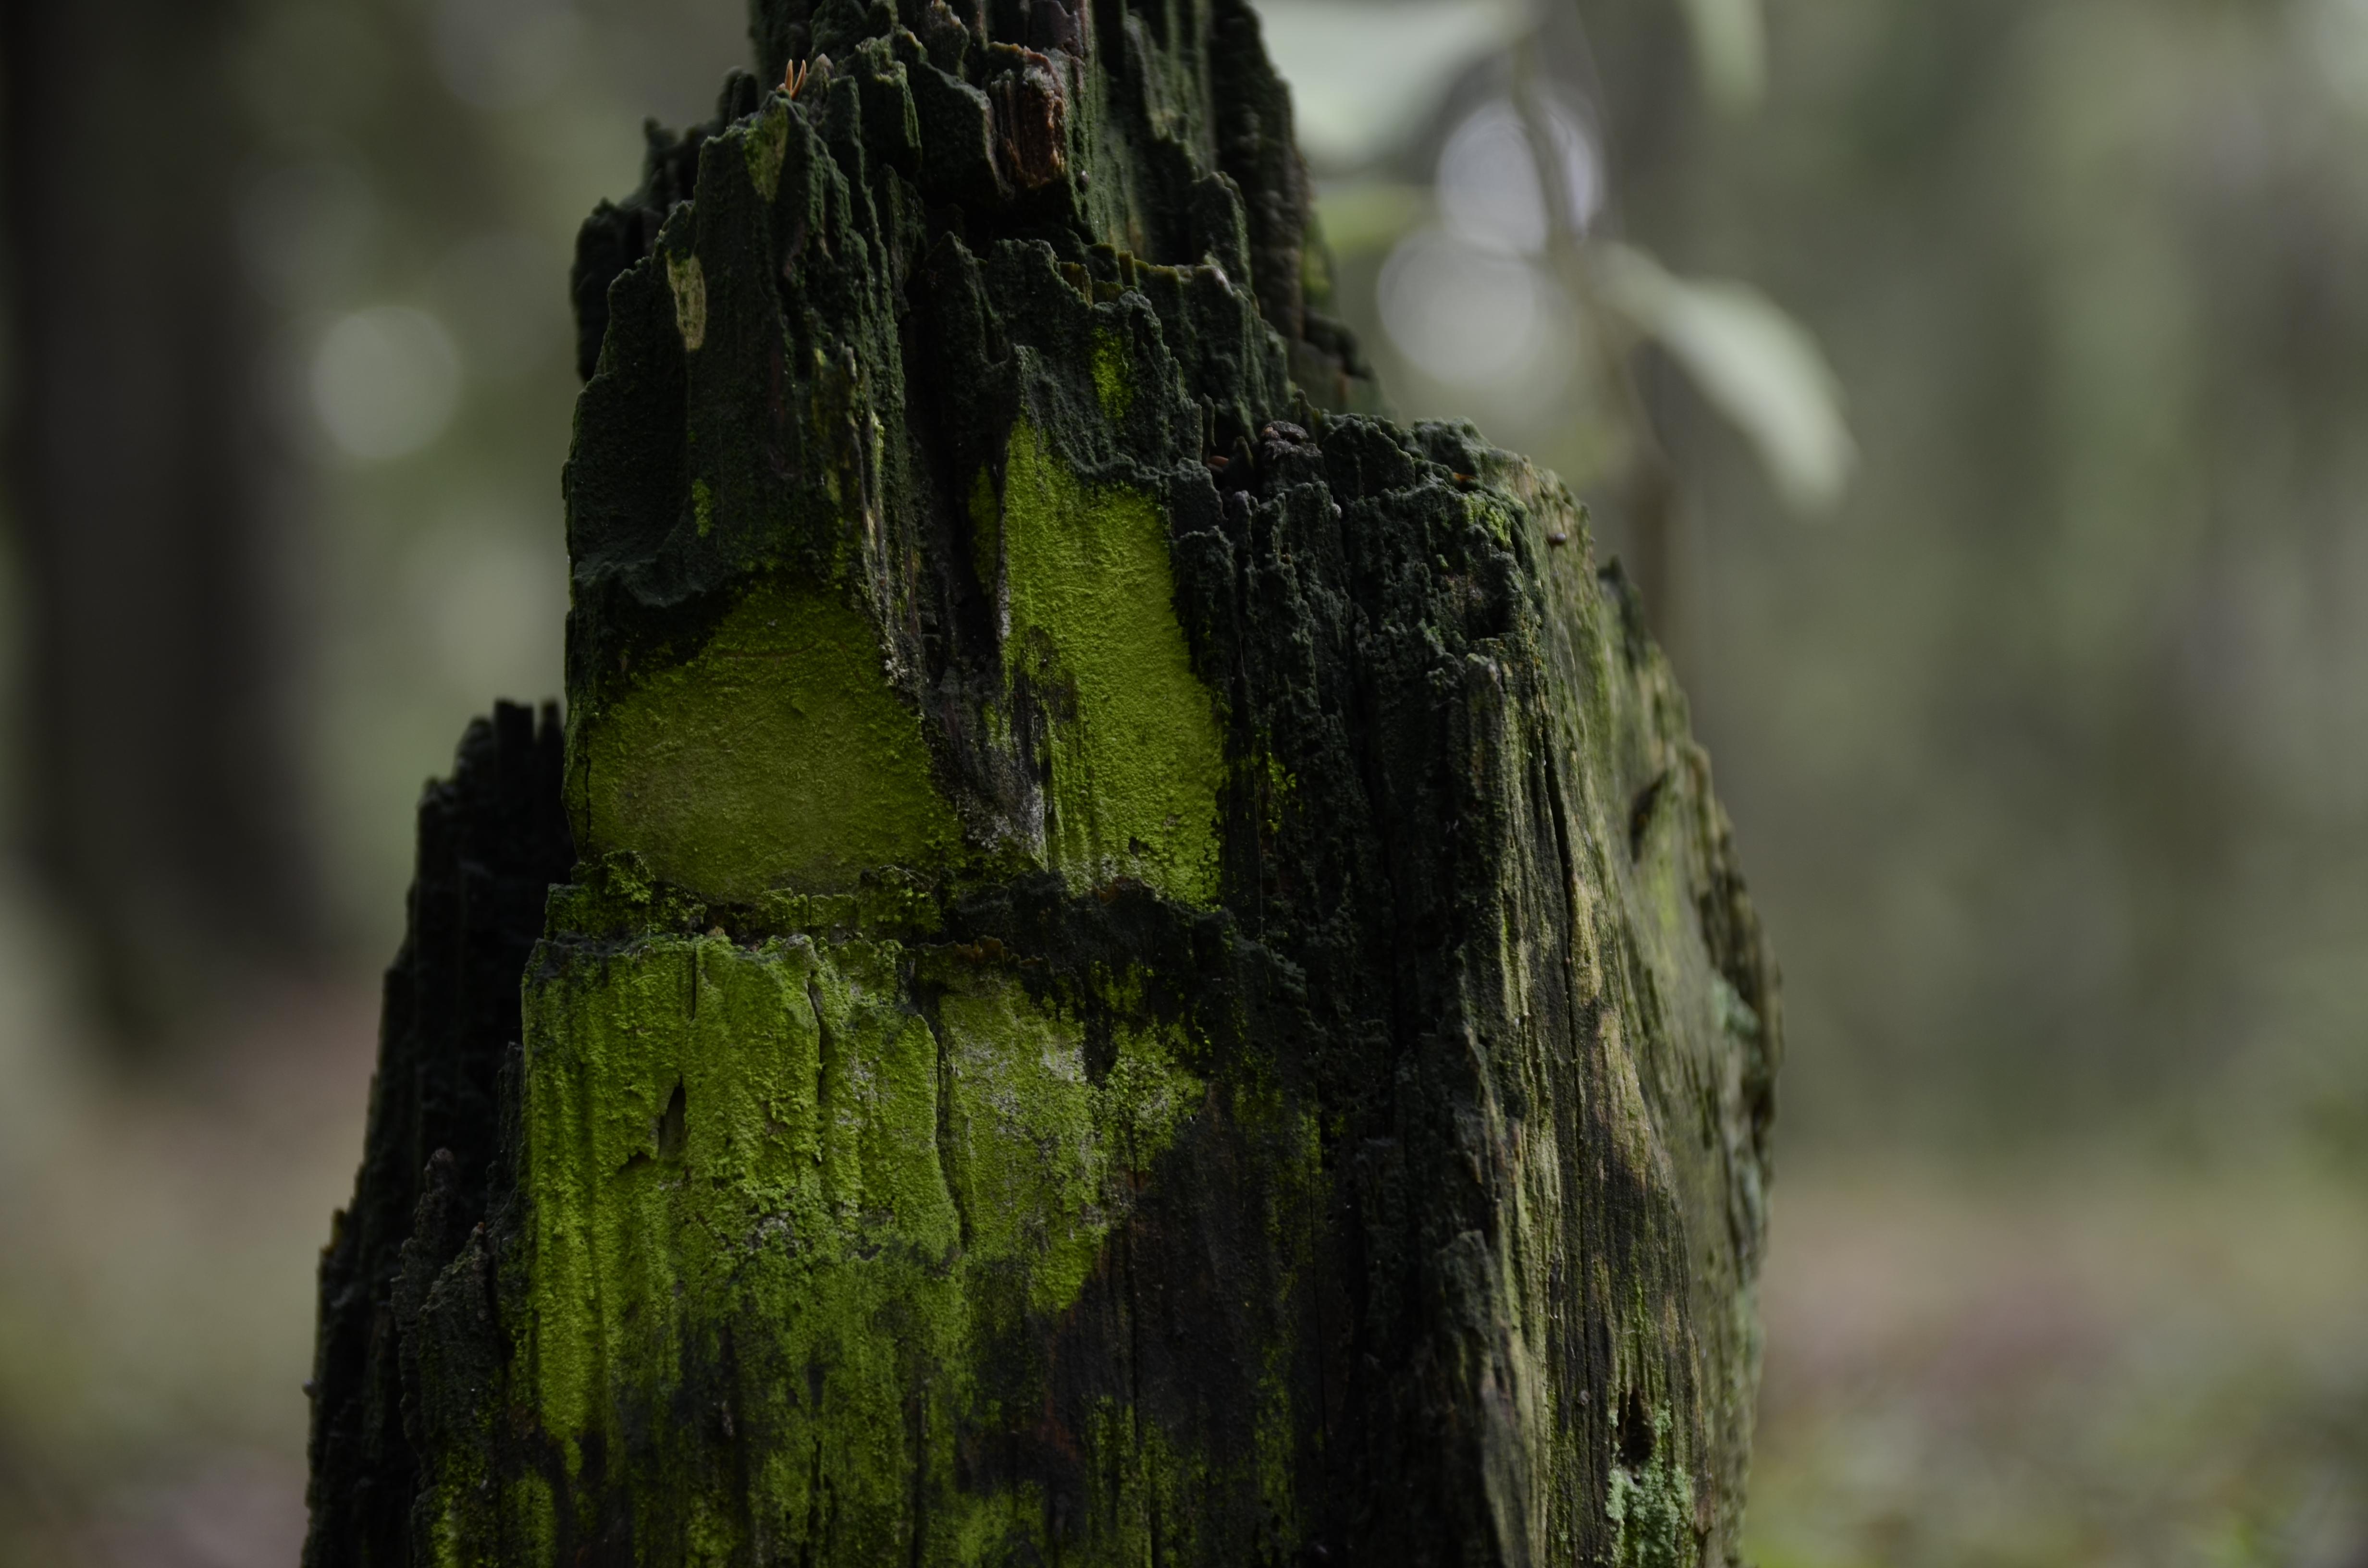 Gnome by jakobhaq